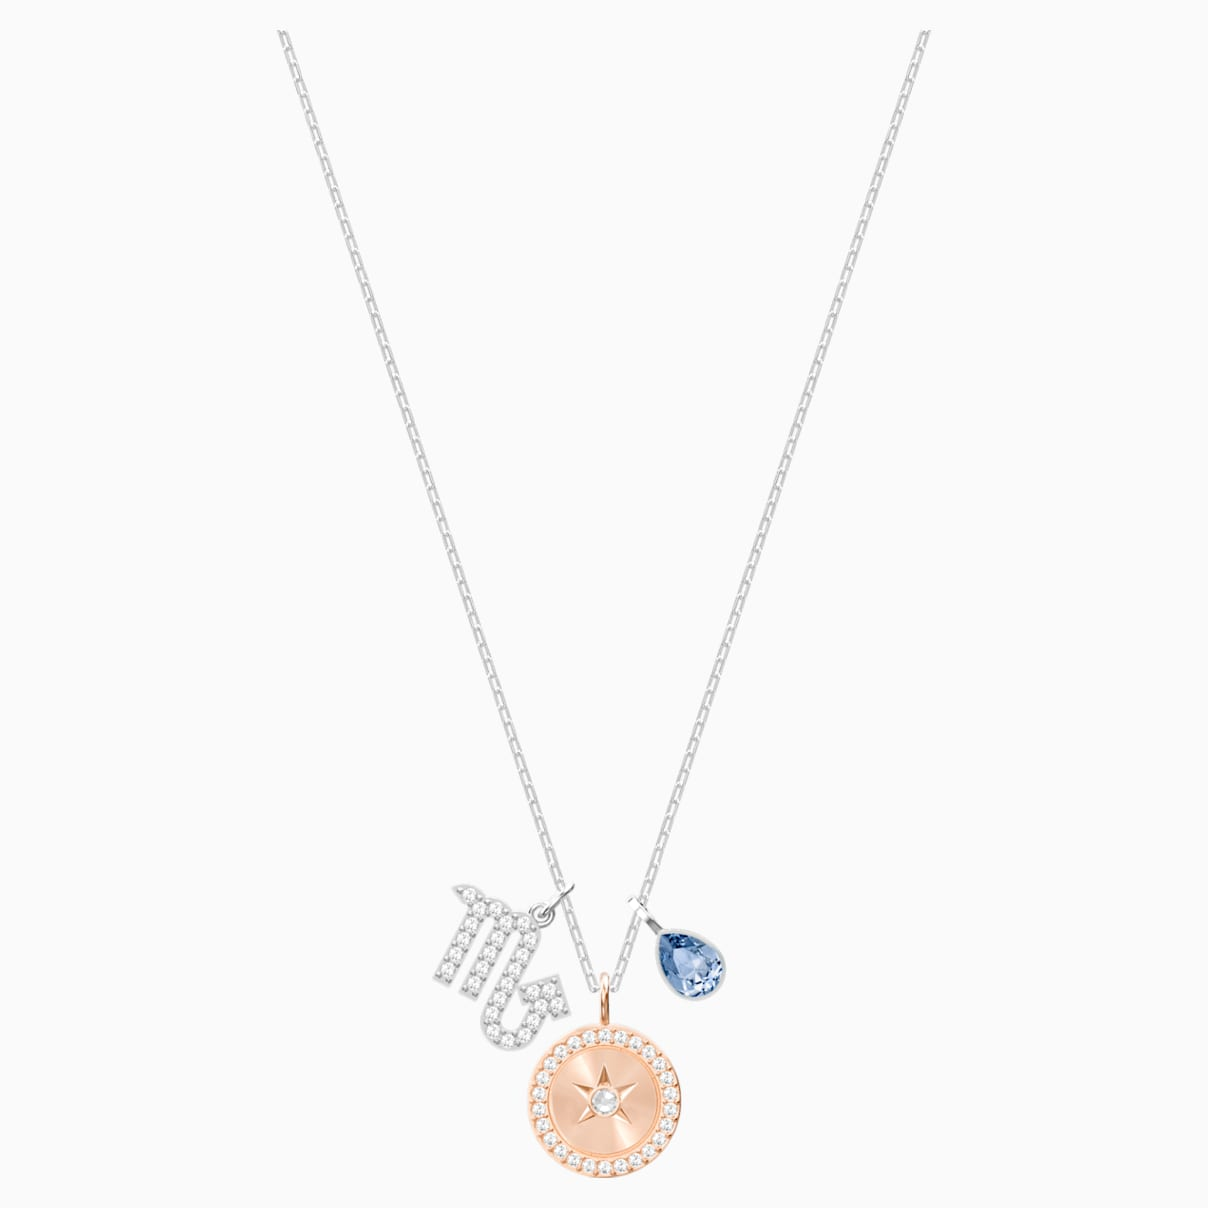 Pendentif zodiac scorpion bleu métal rhodié